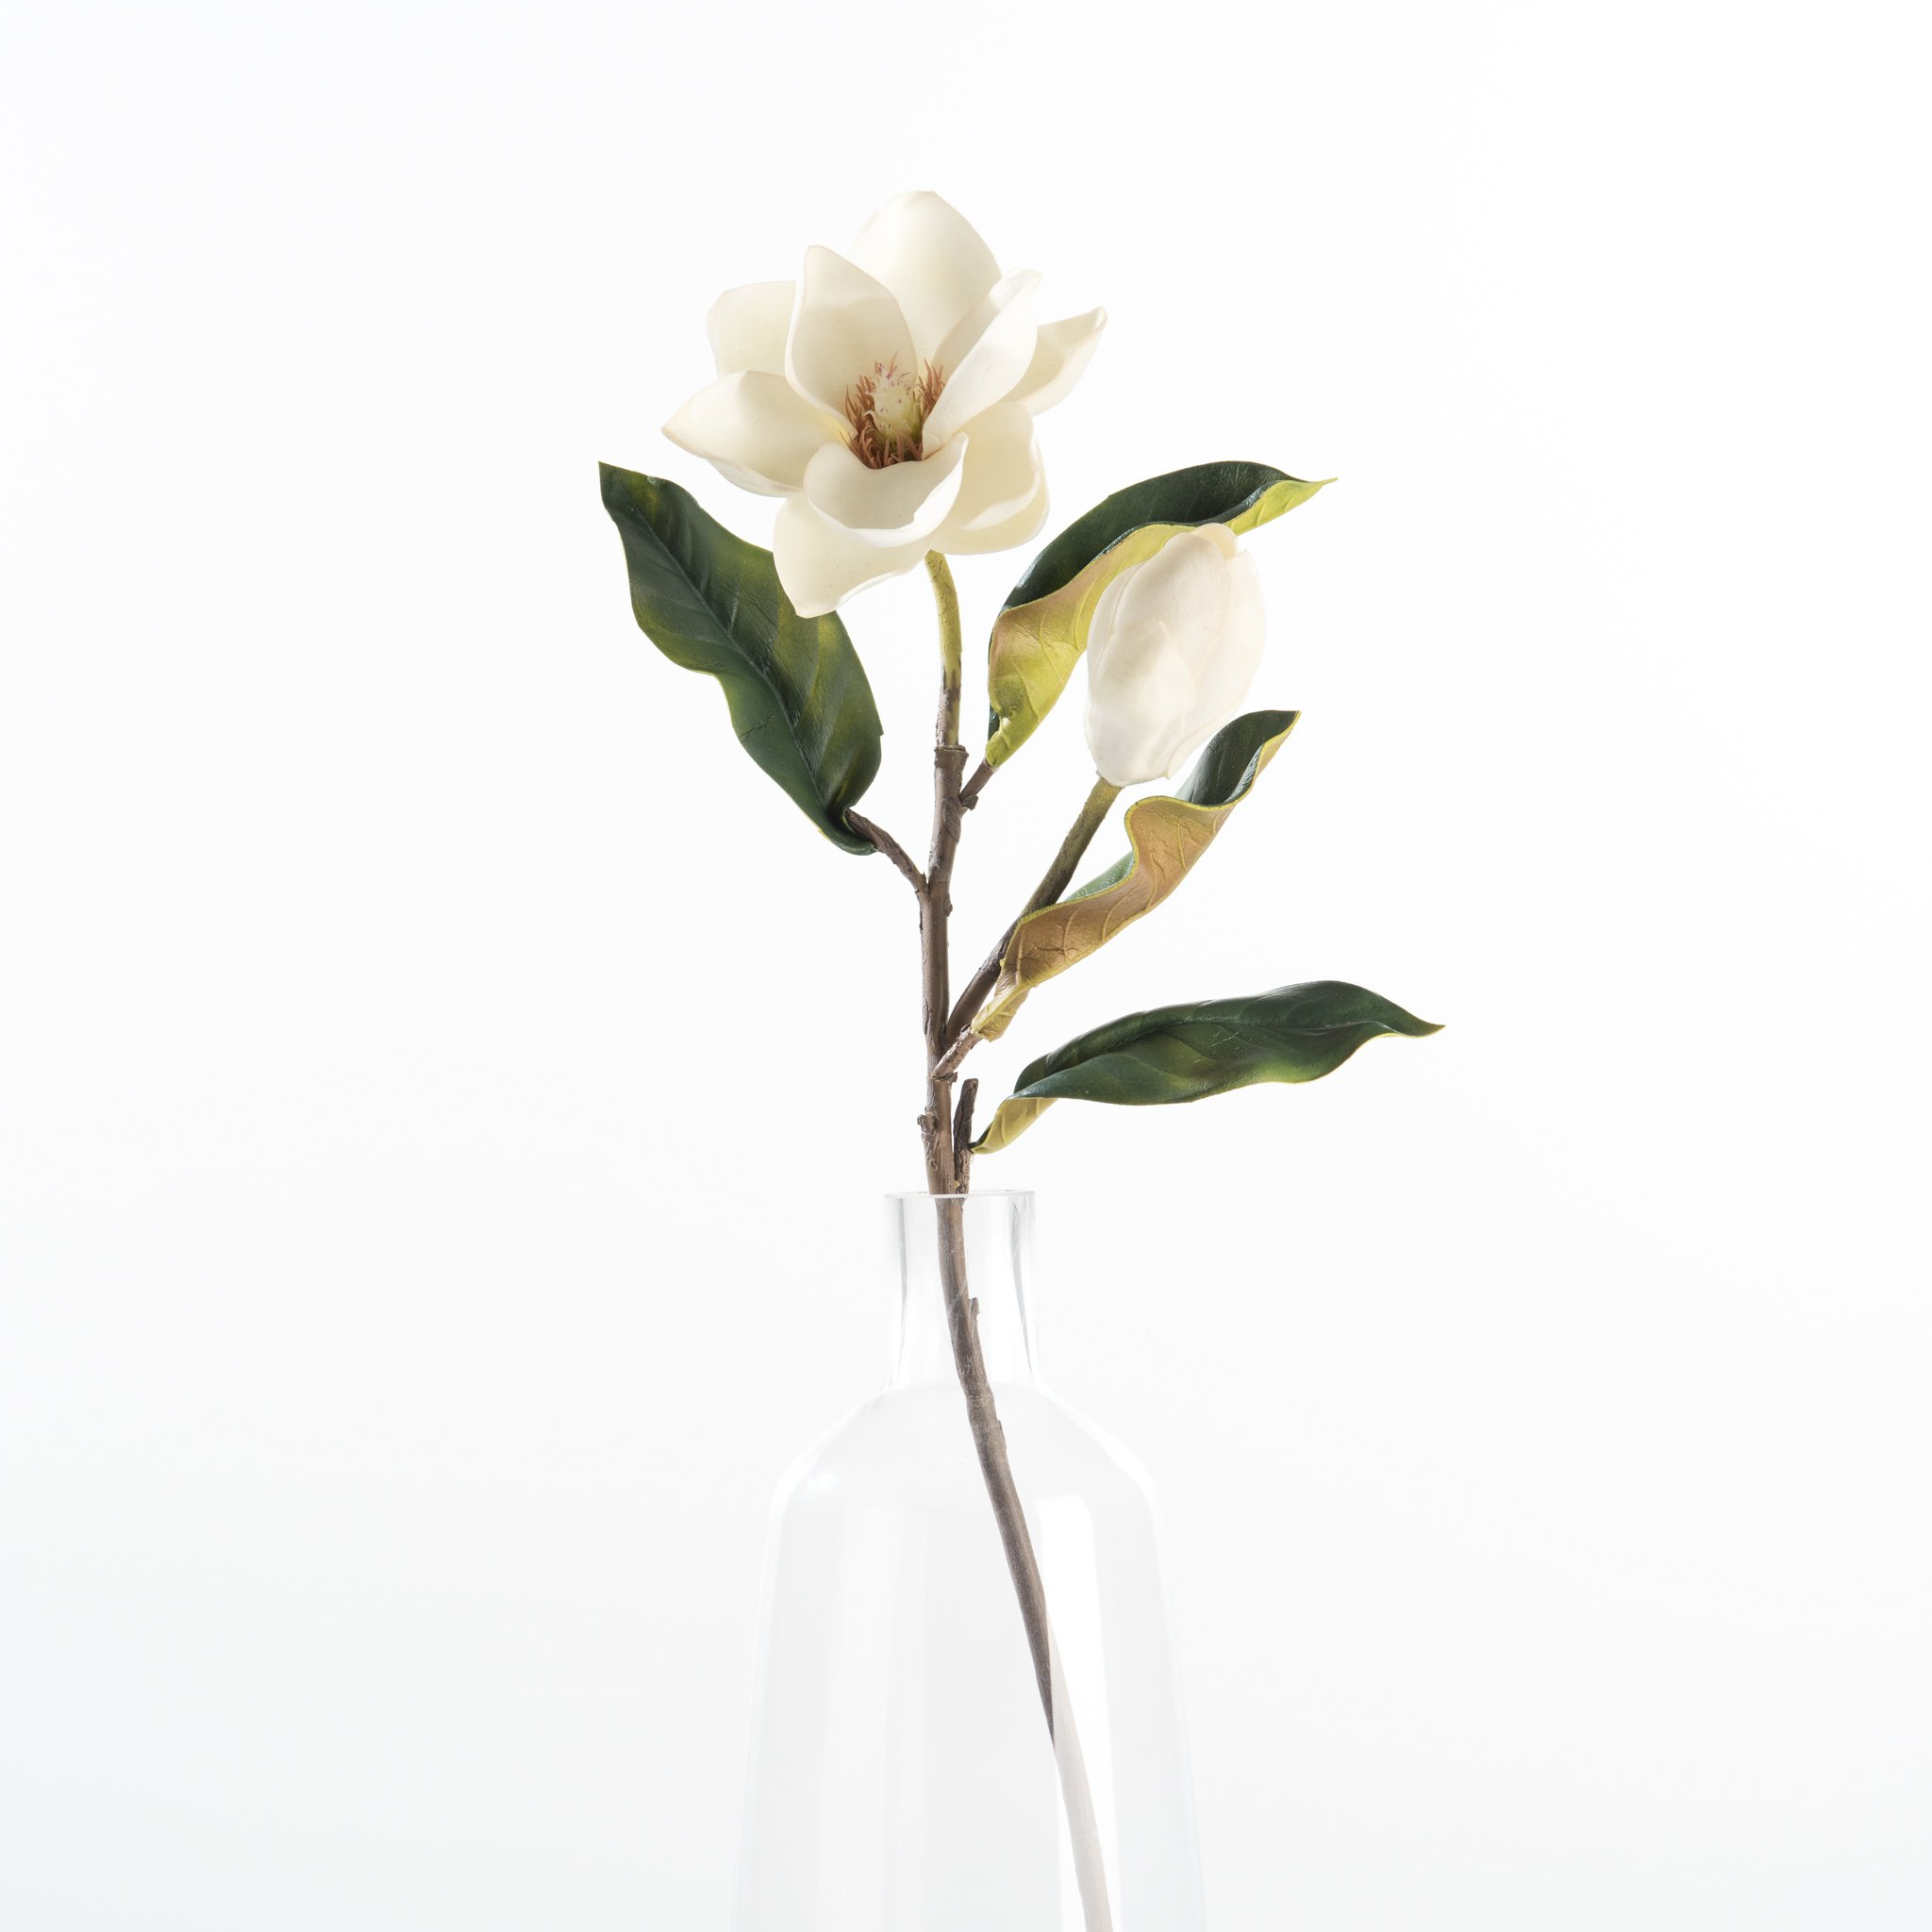 Magnolia Bud And Bloom Stem Magnolia Flower White Magnolia Flower Aesthetic